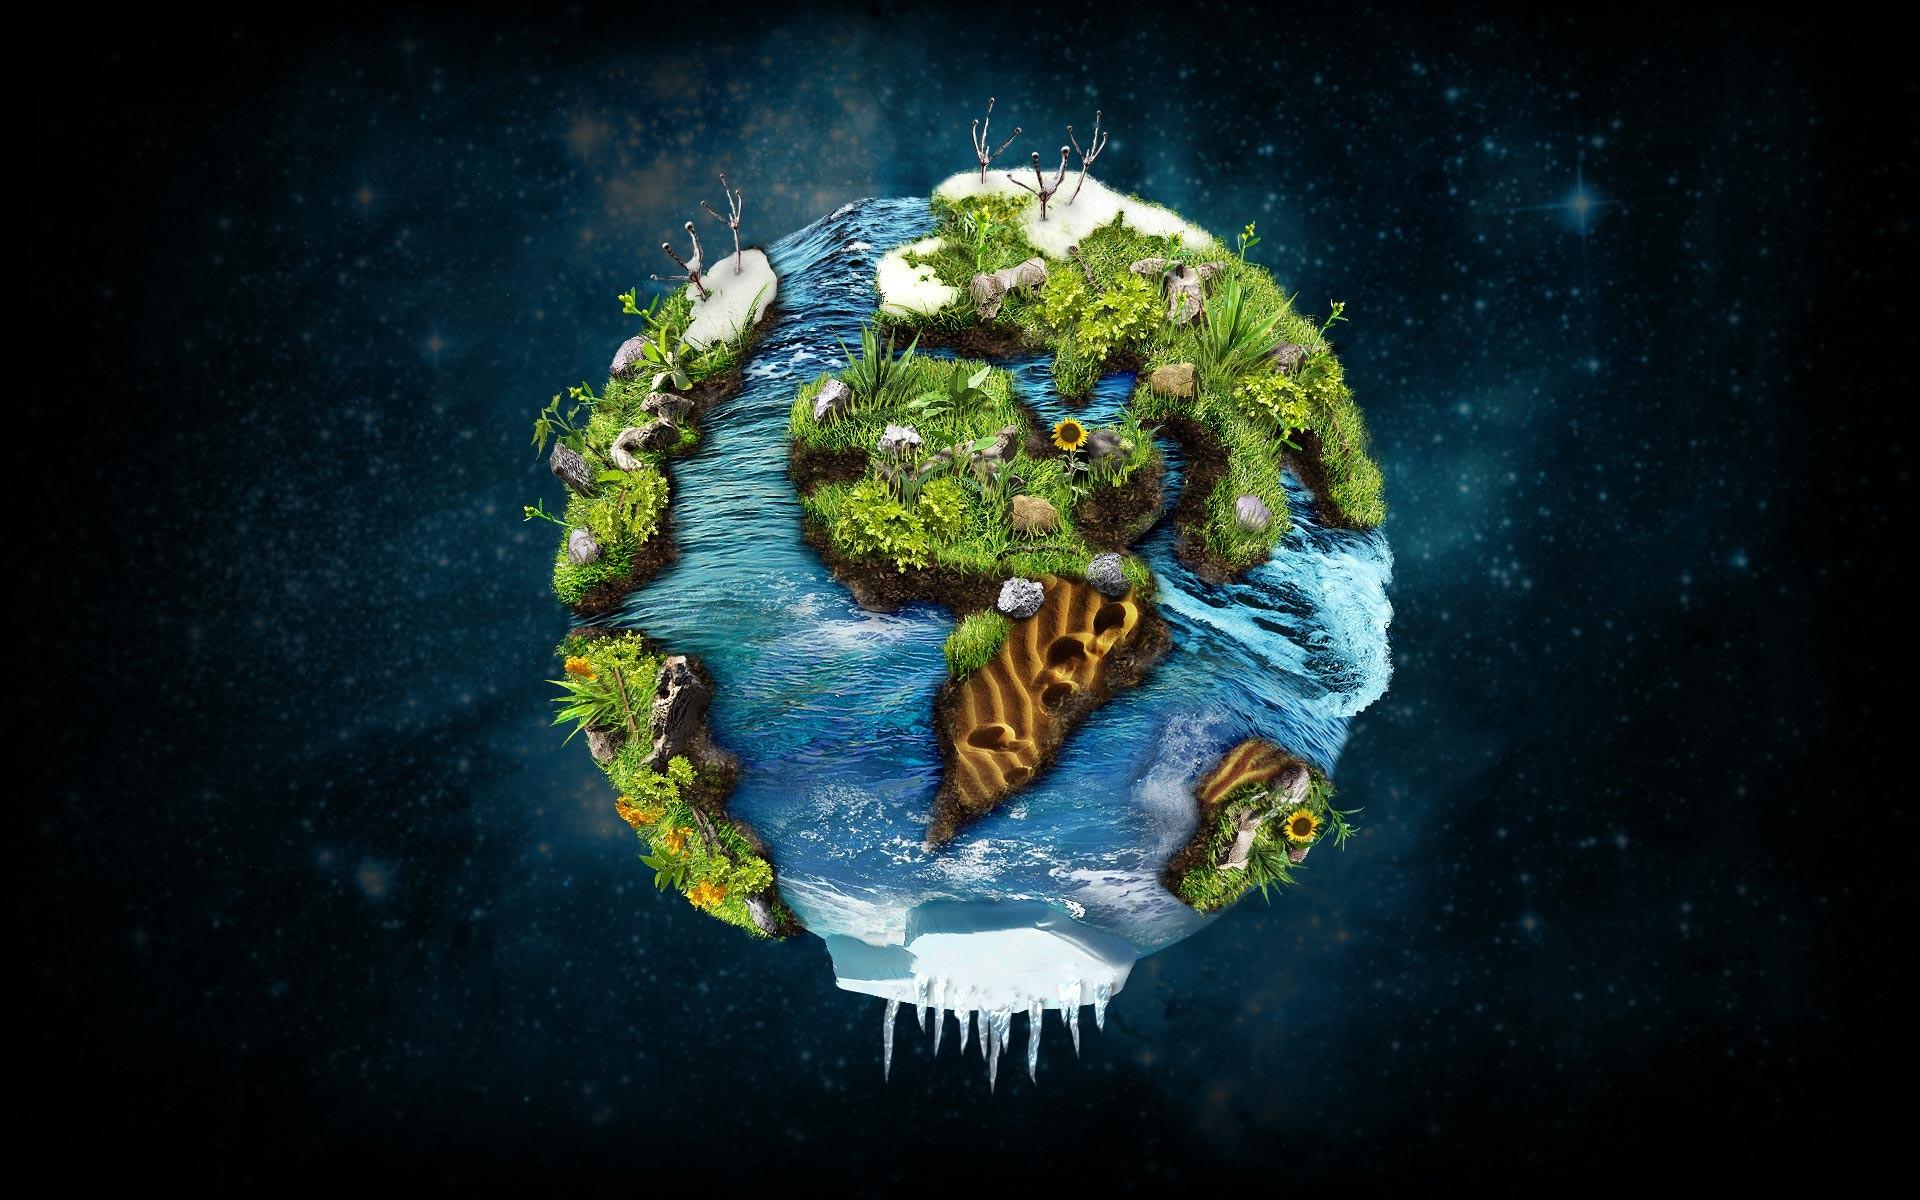 FunMozar – 3D Earth Wallpapers